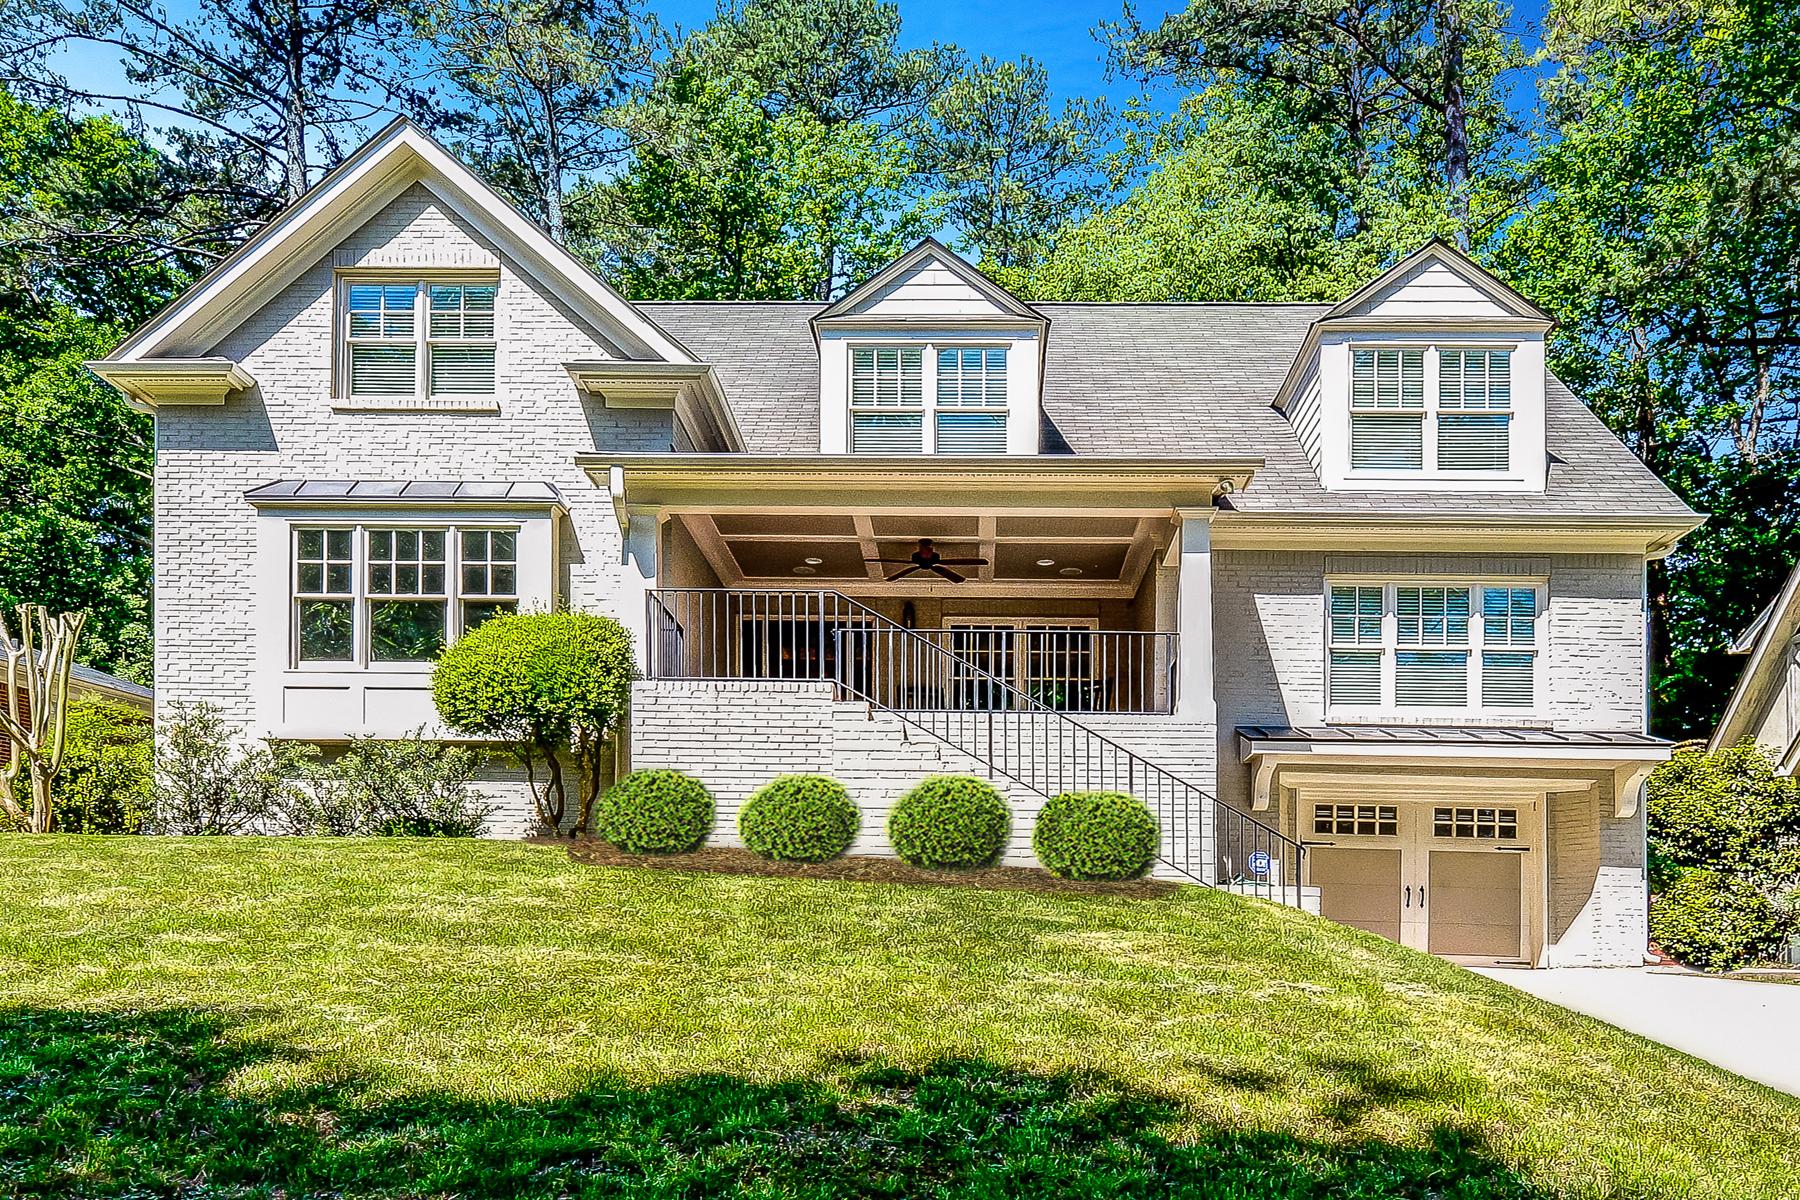 Single Family Home for Sale at Exceptional Total Renovation In Morningside 1370 Pasadena Avenue NE Atlanta, Georgia 30306 United States